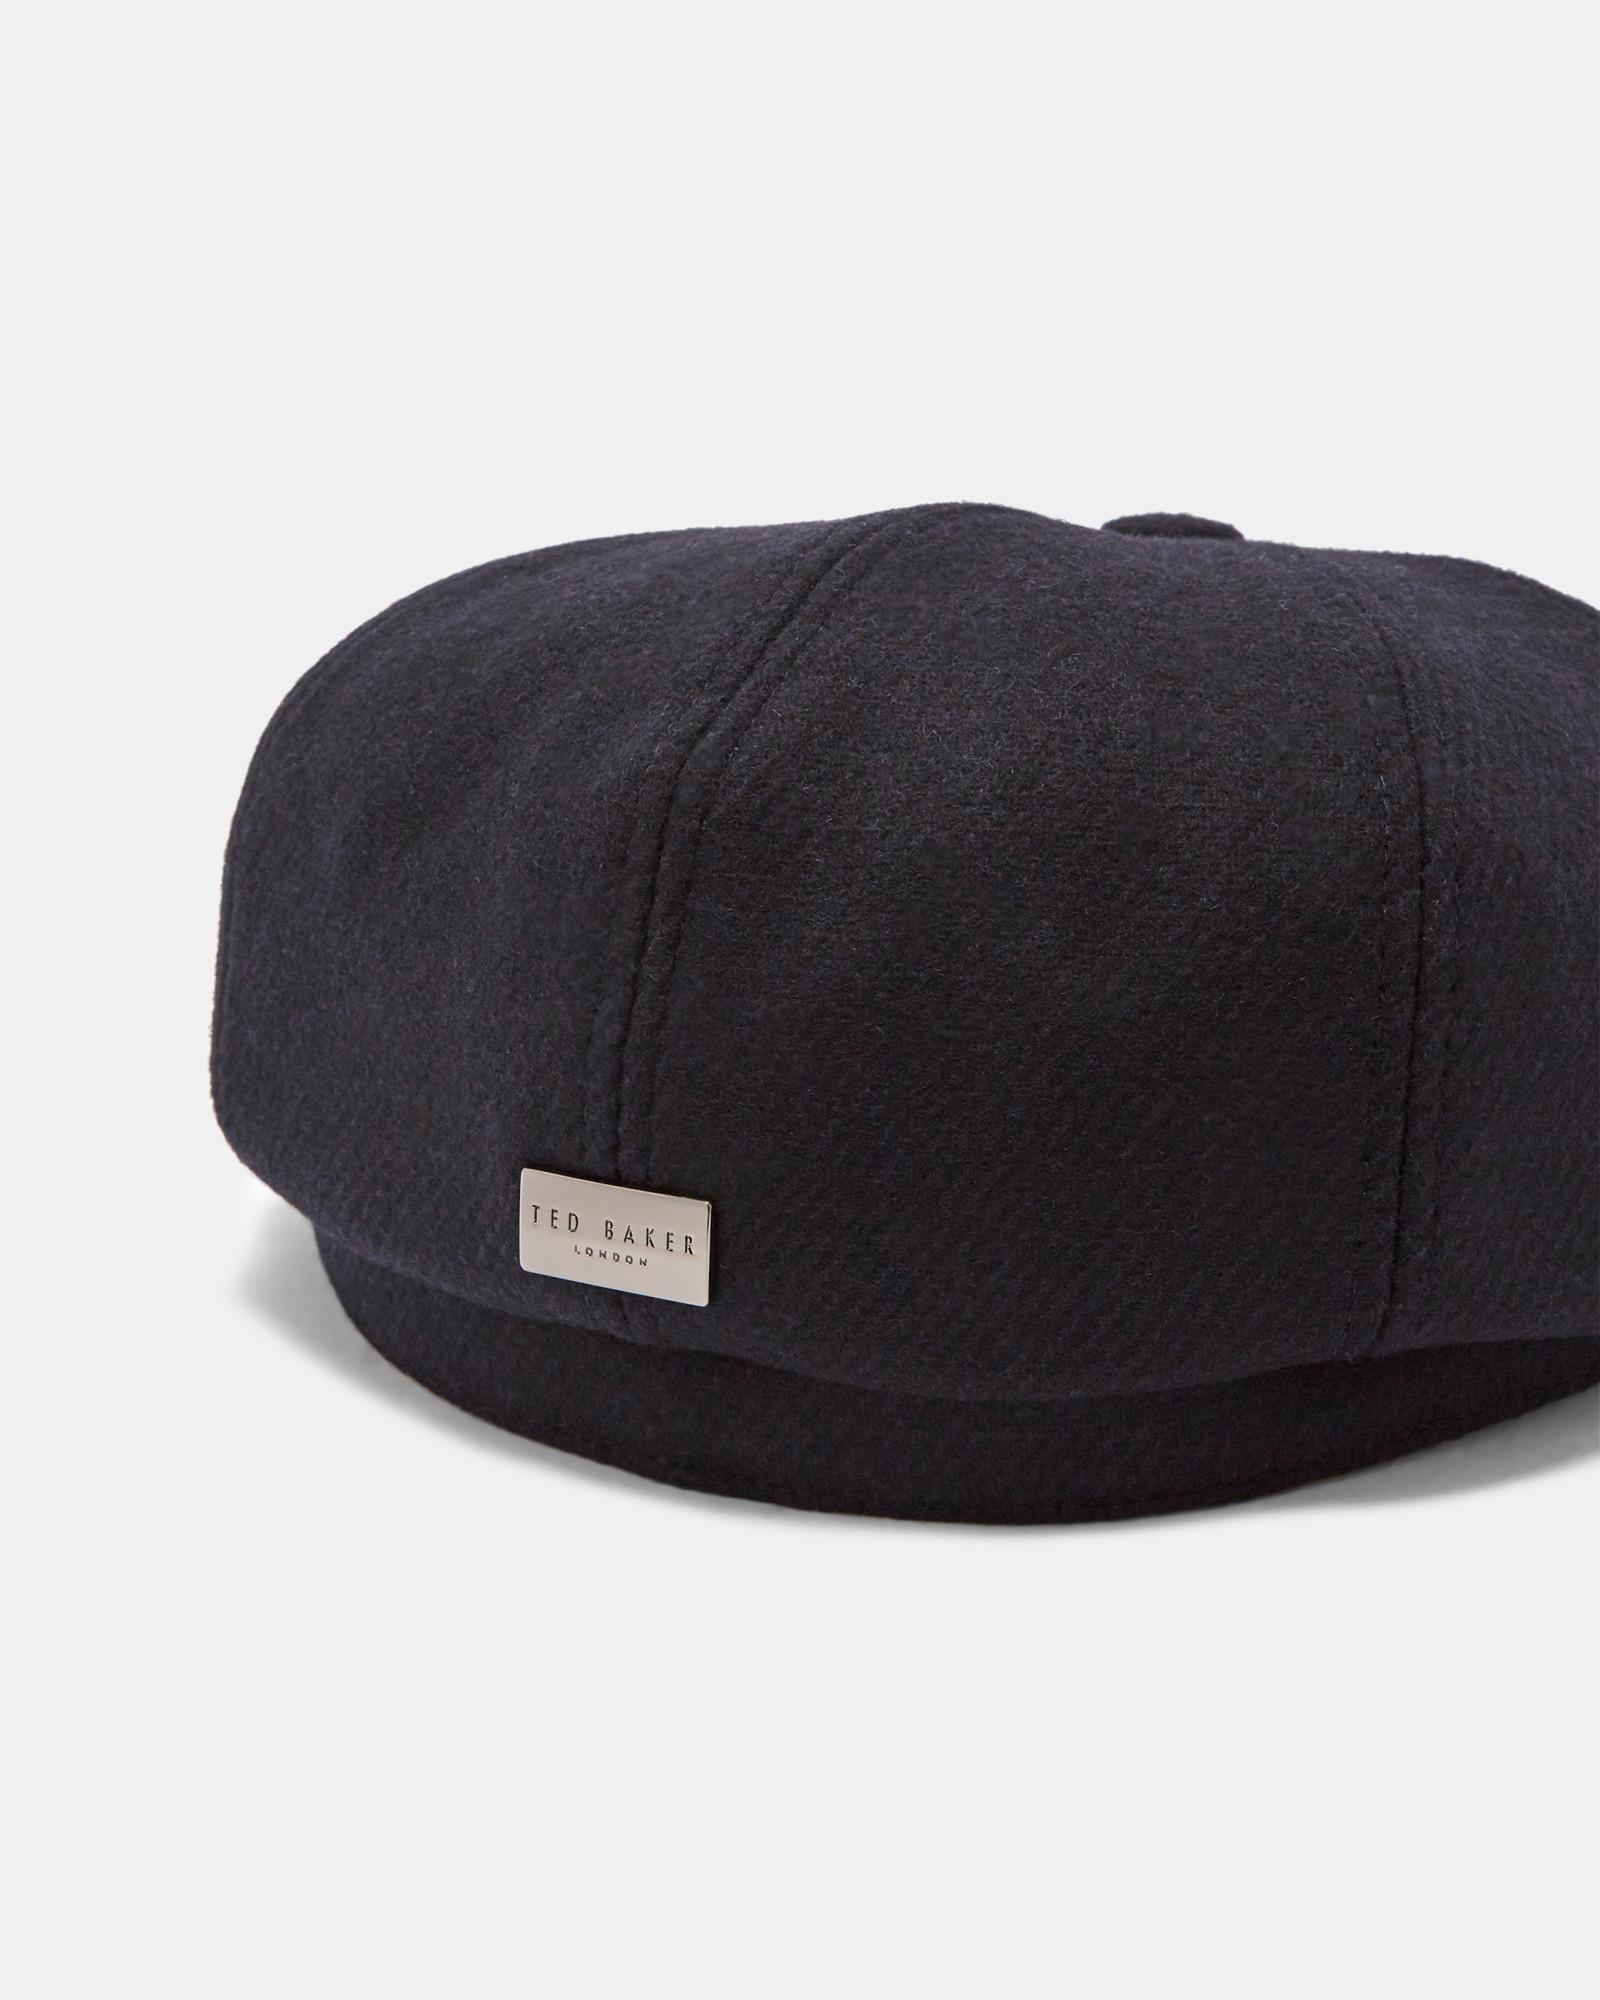 e559d148966 ... Ted Baker Structured Baker Boy Hat in Blue for Men - Lyst promo code  15629 840e7 ...